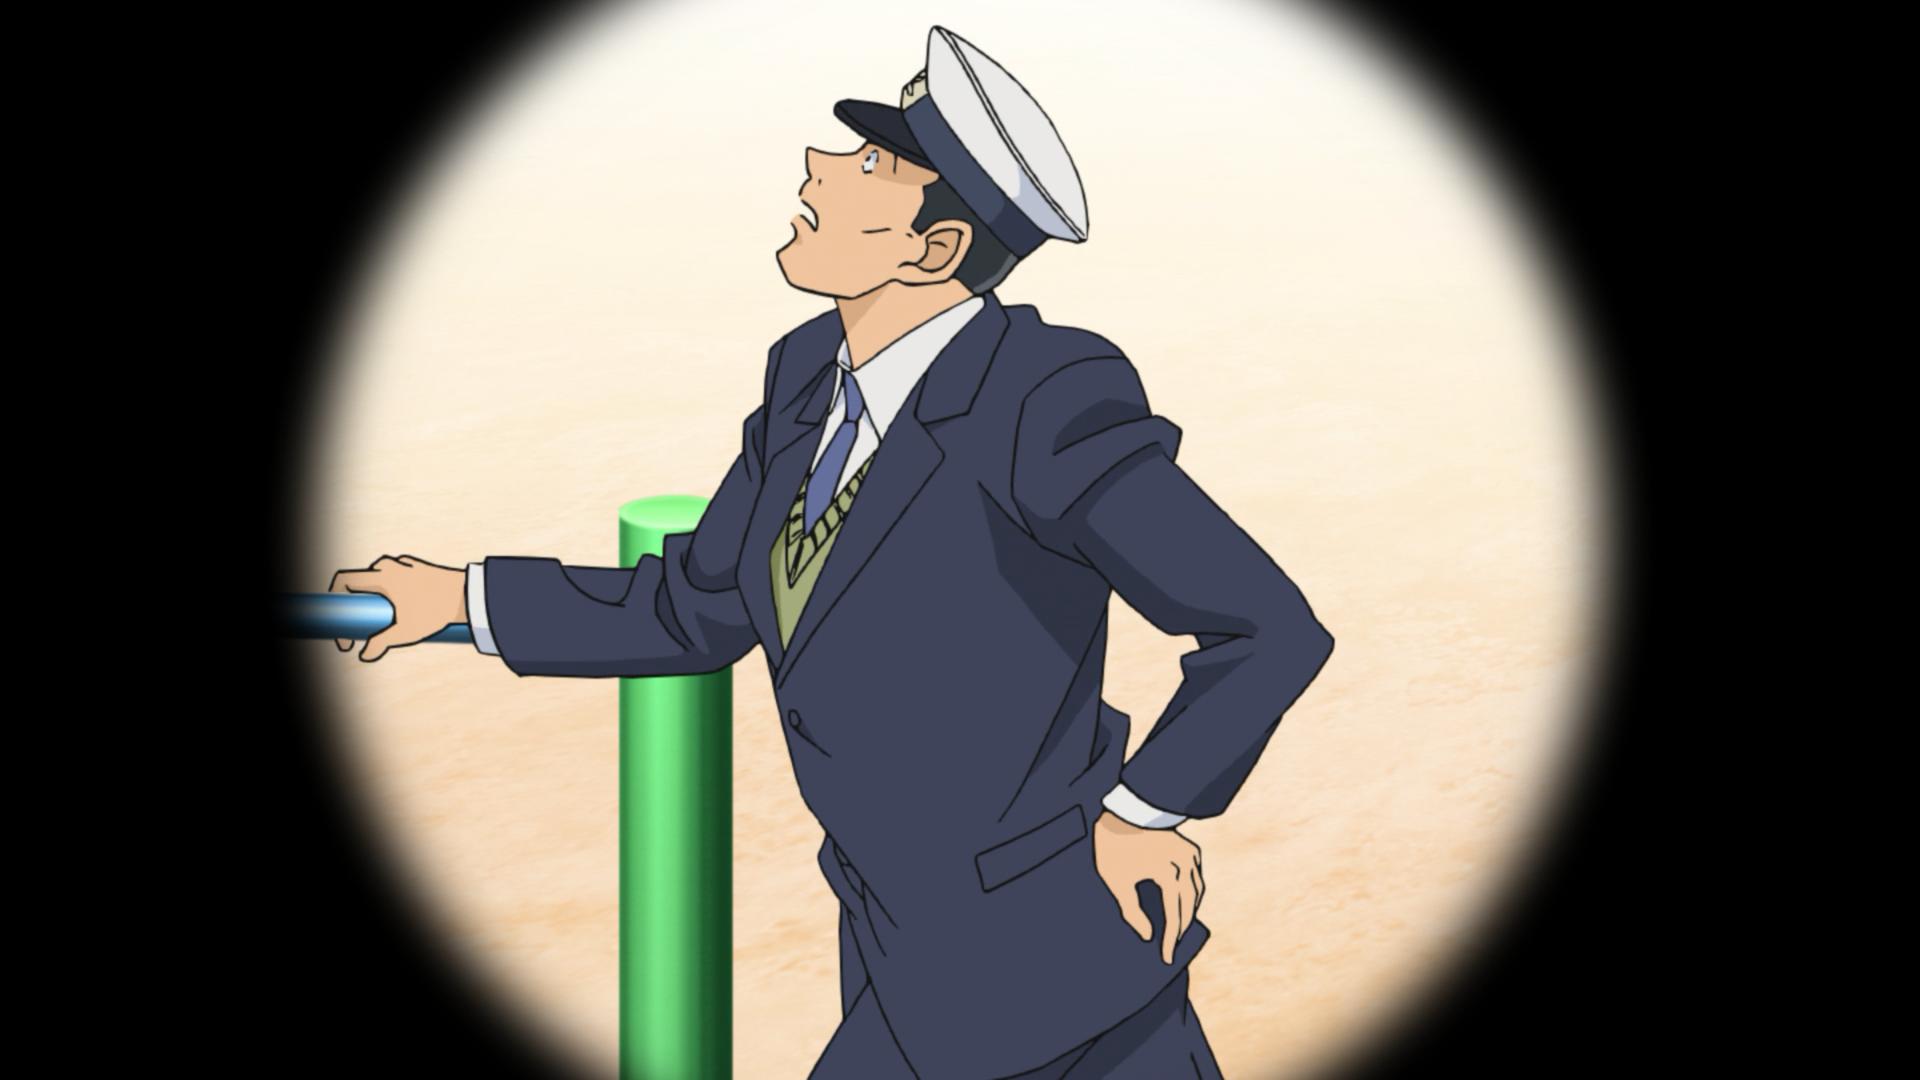 HorribleSubs_Detective_Conan_-_978_1080p.mkv-00.15.19.961.png